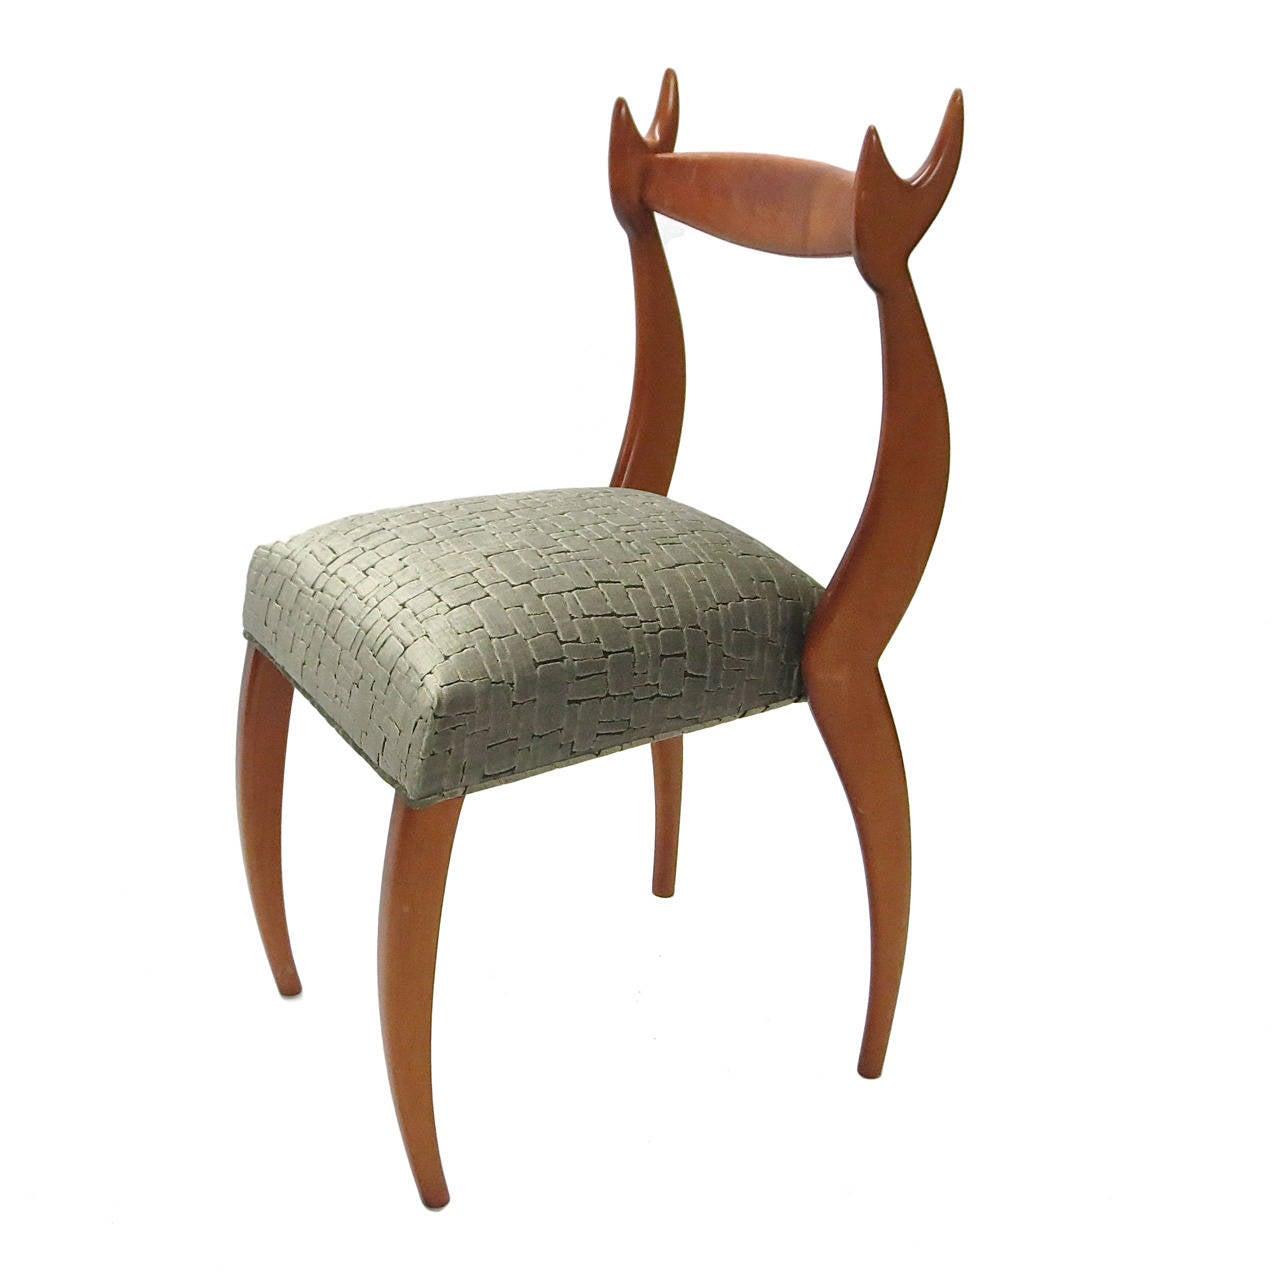 Single 'My Dear Chair' by Sergio Savarese for Dialogica, SoHo, NY, circa 1988